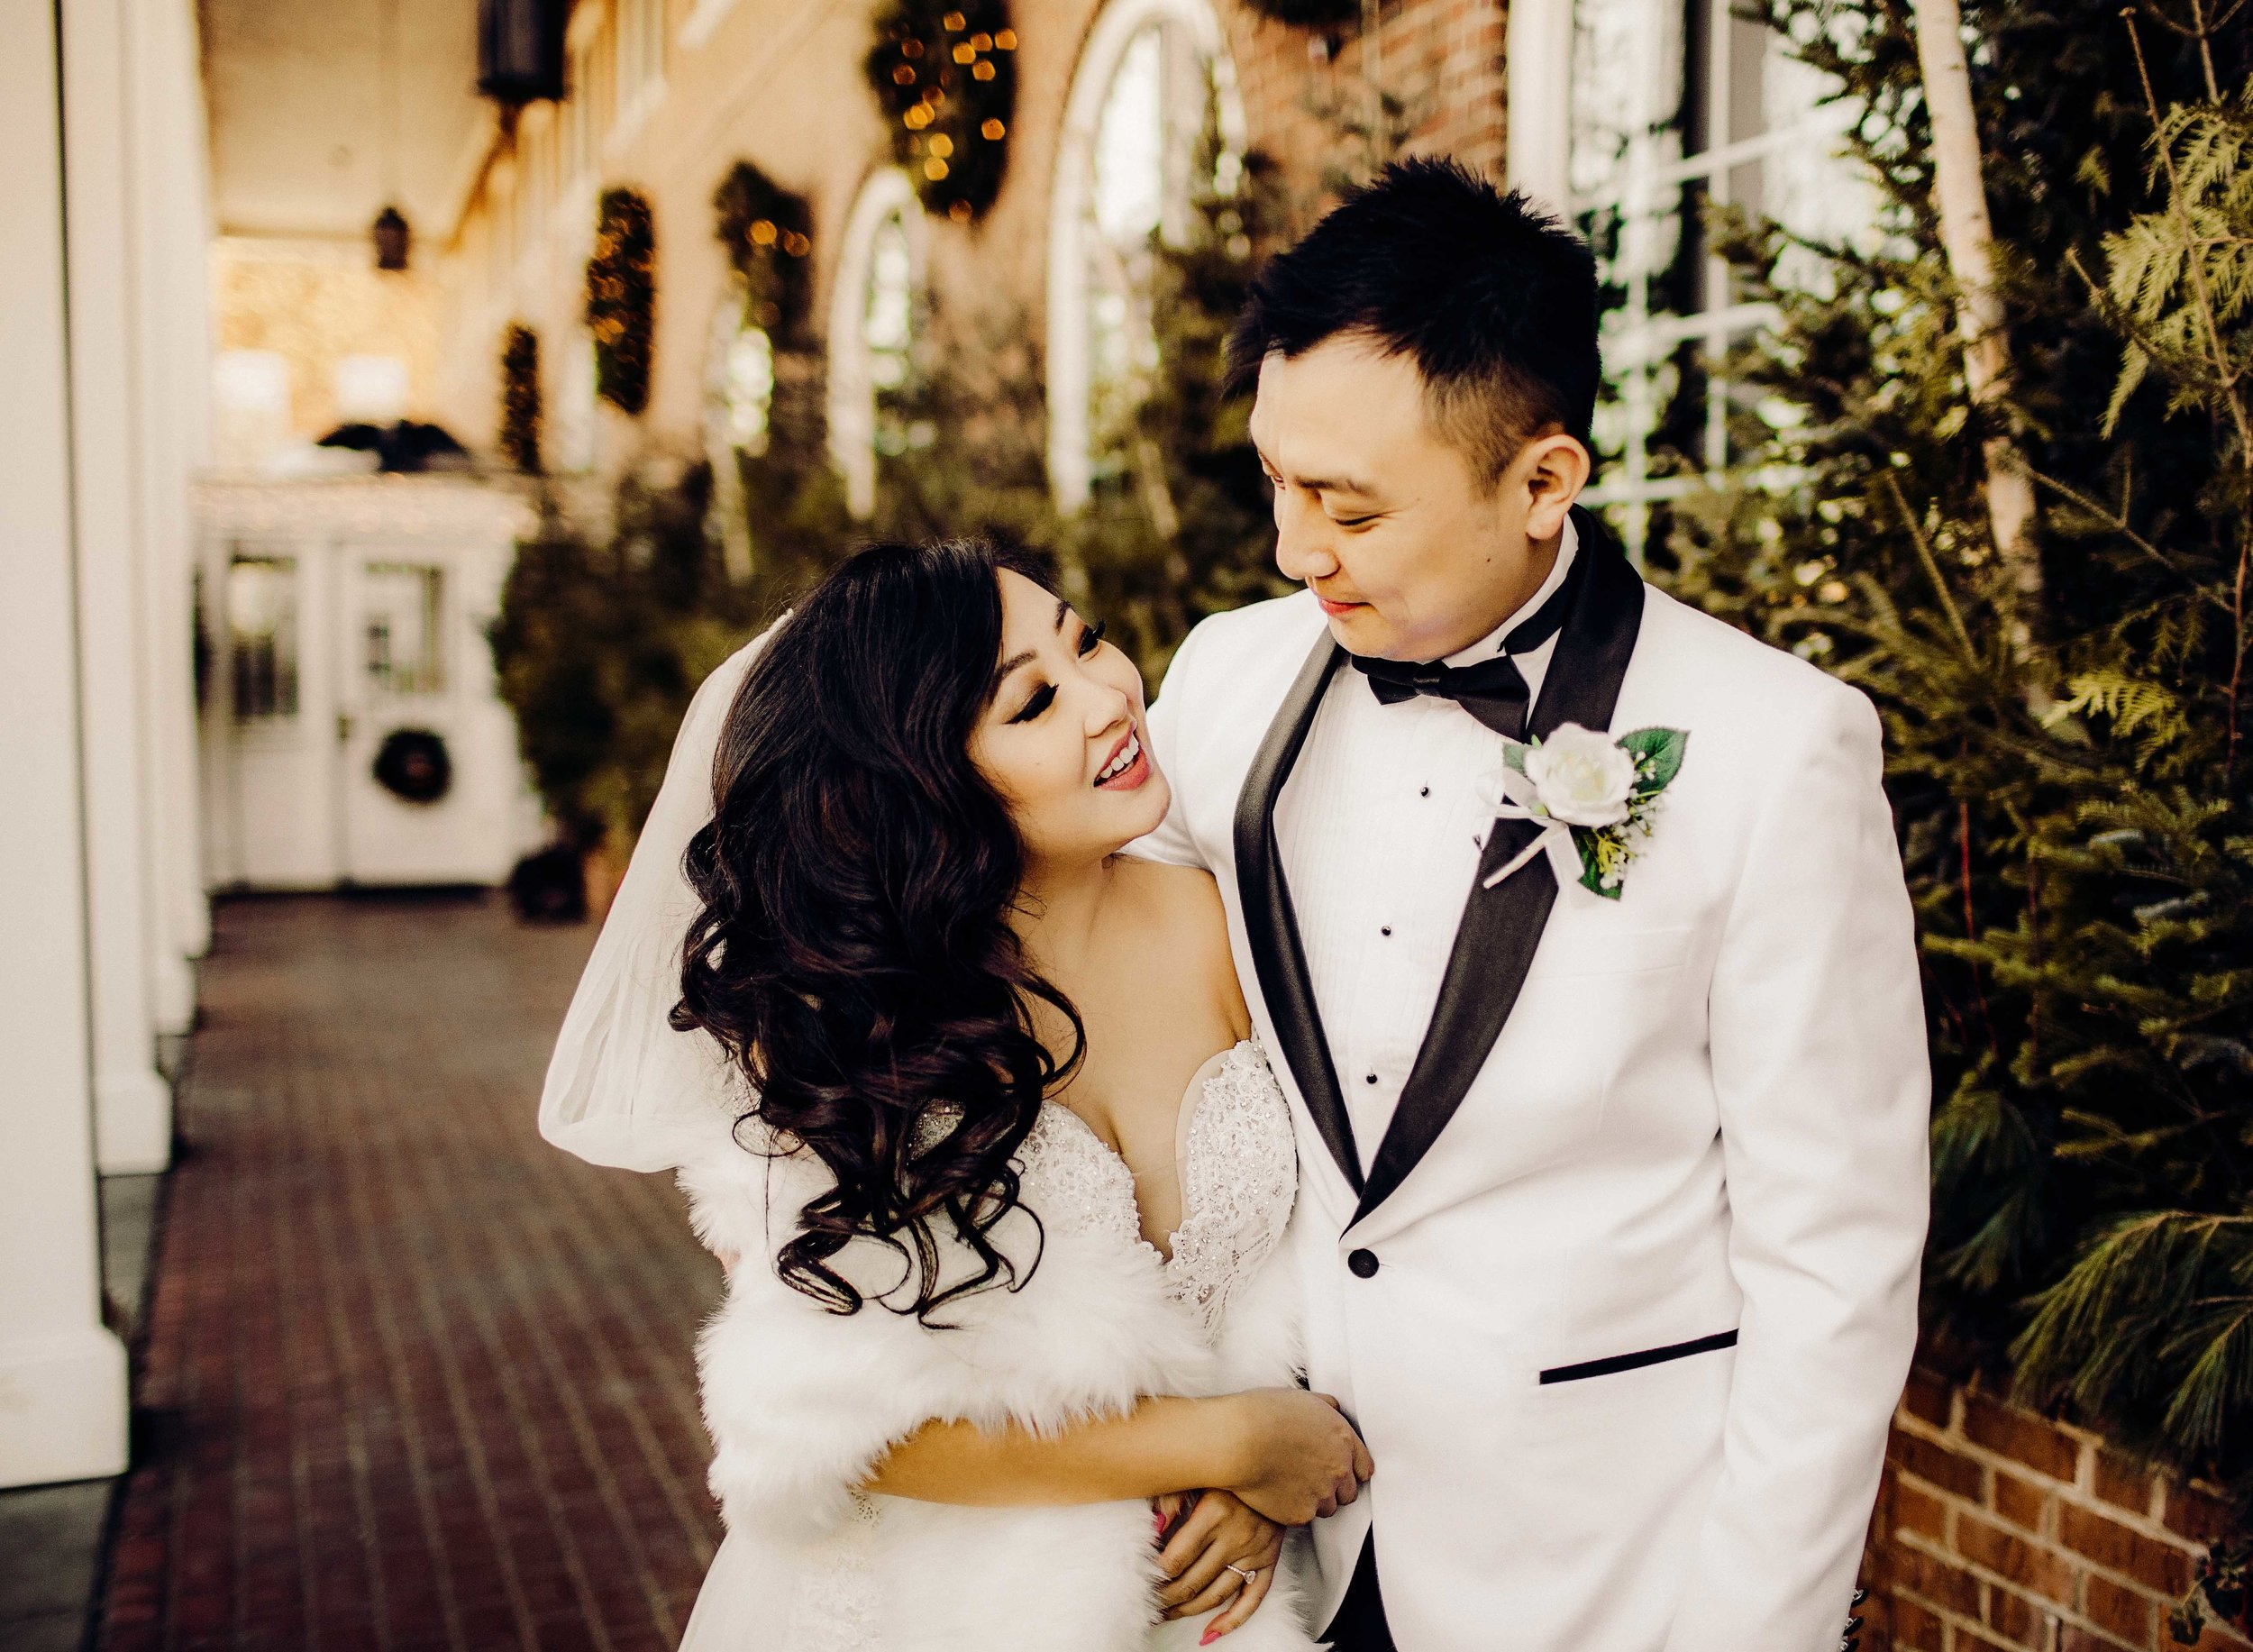 Honey + Yao, Part II, The Bride and Groom-47.jpg